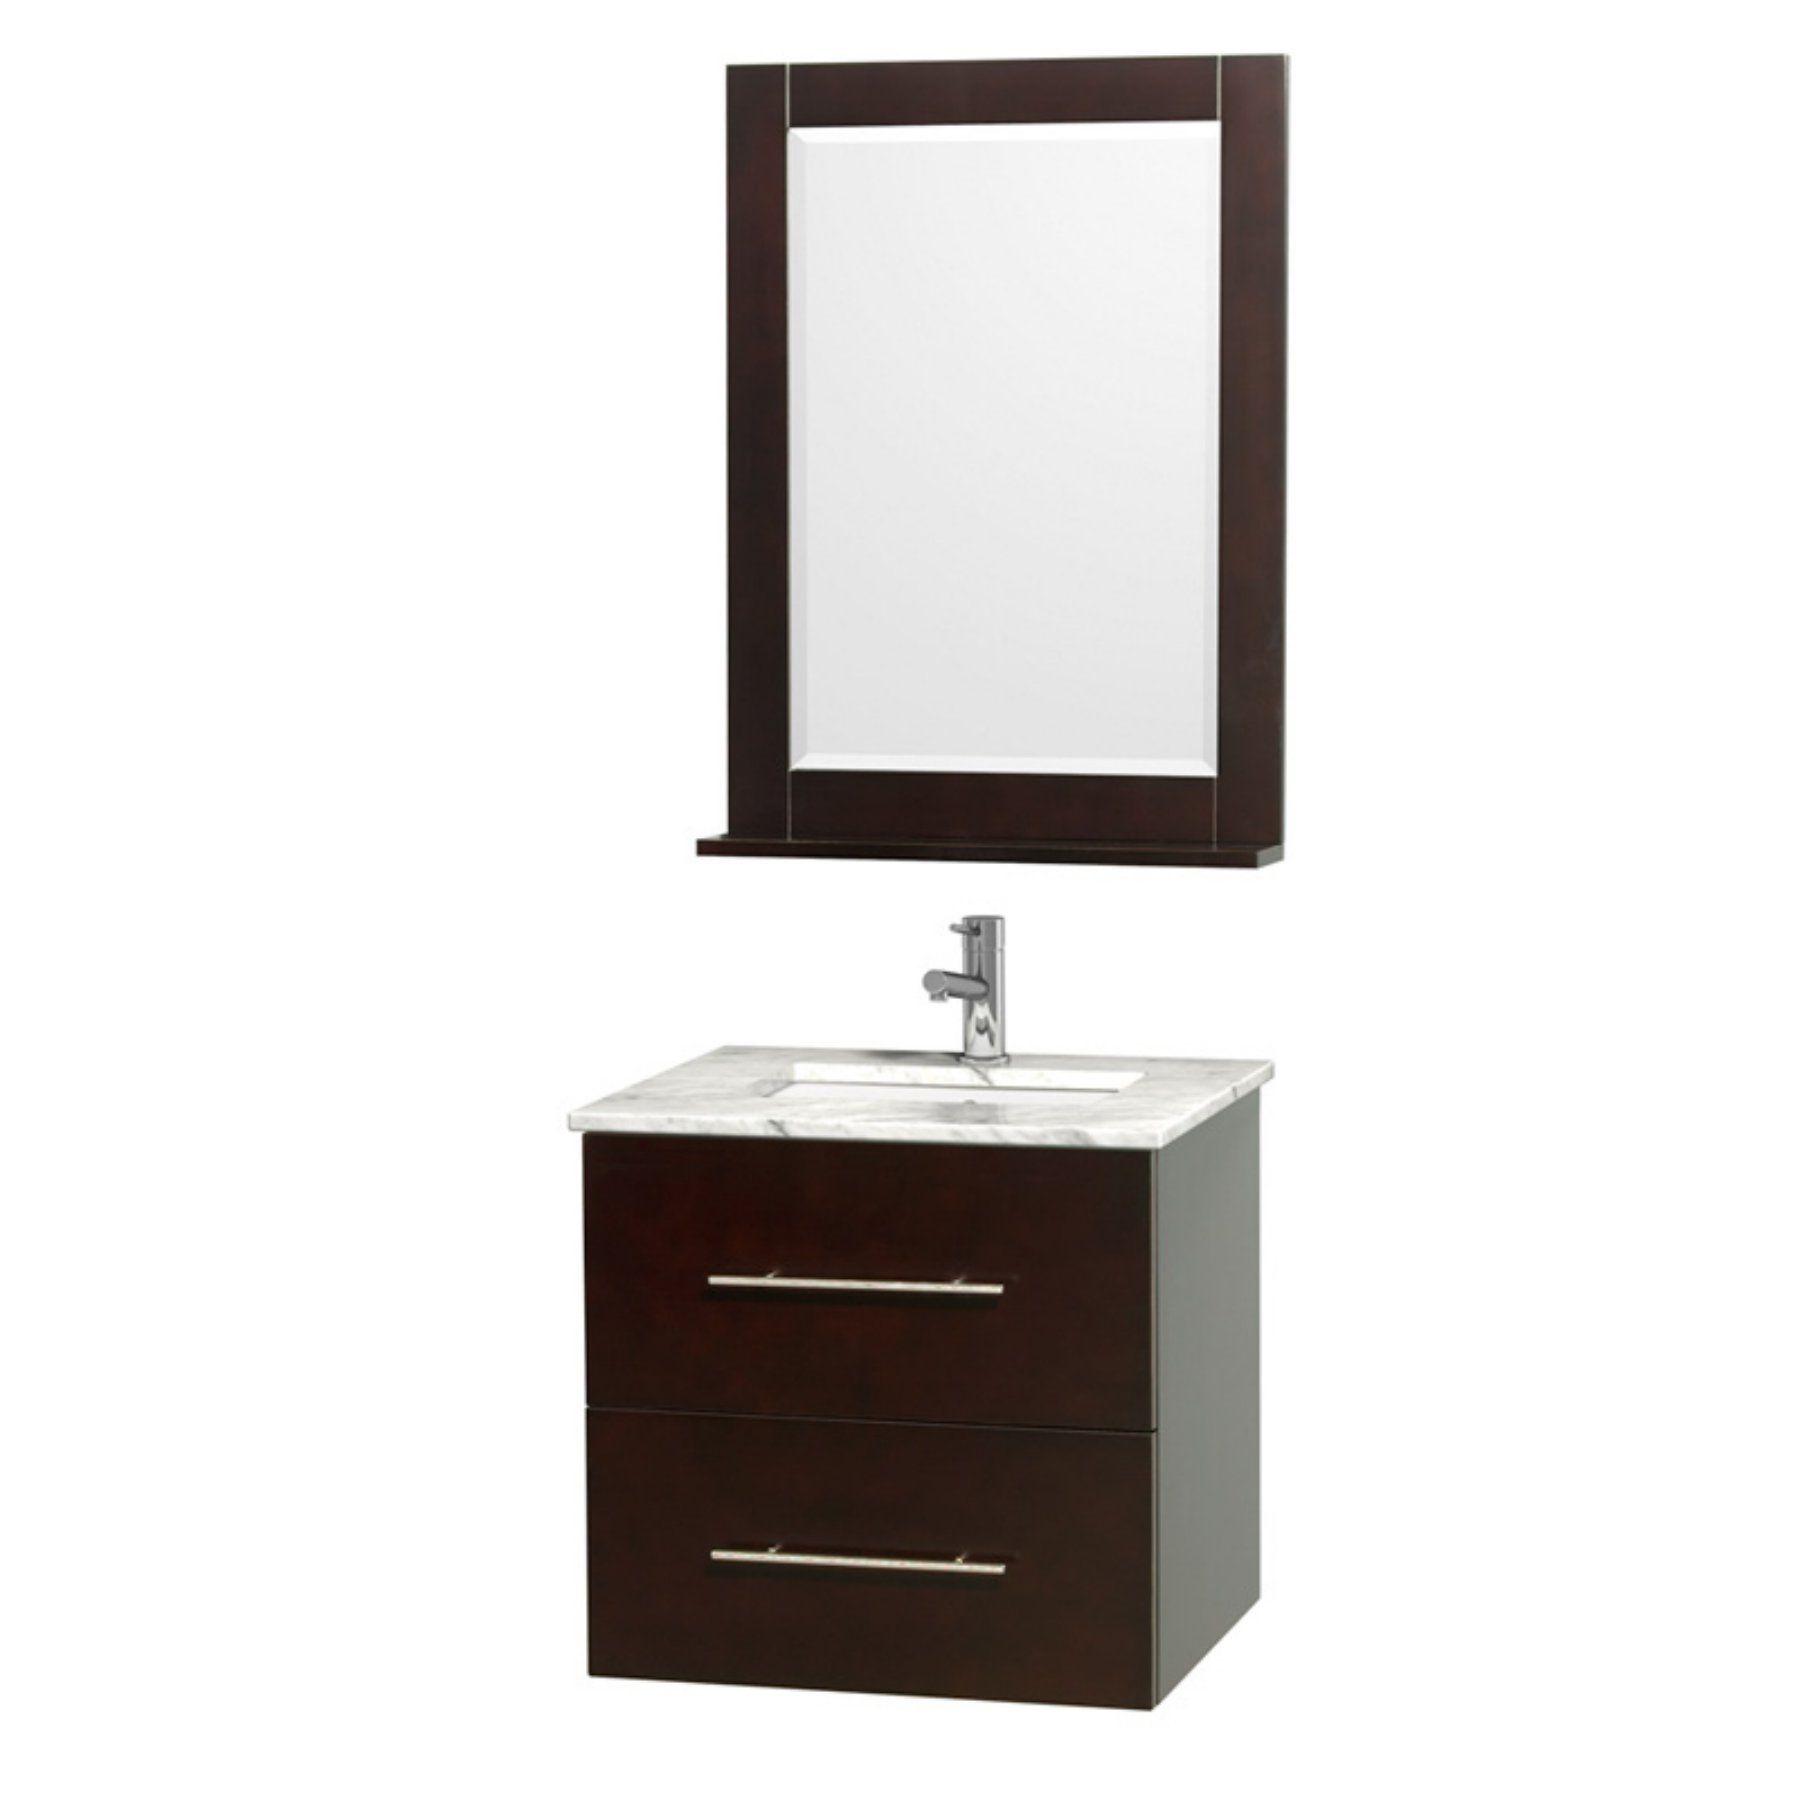 wyndham collection wcvw00924ses centra 24 in single bathroom vanity rh gr pinterest com